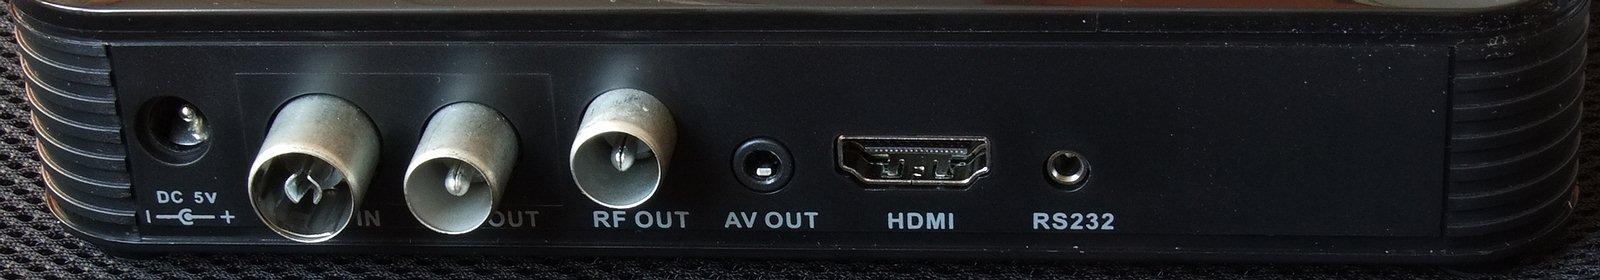 openbox-t2-02m-hd-4.jpg